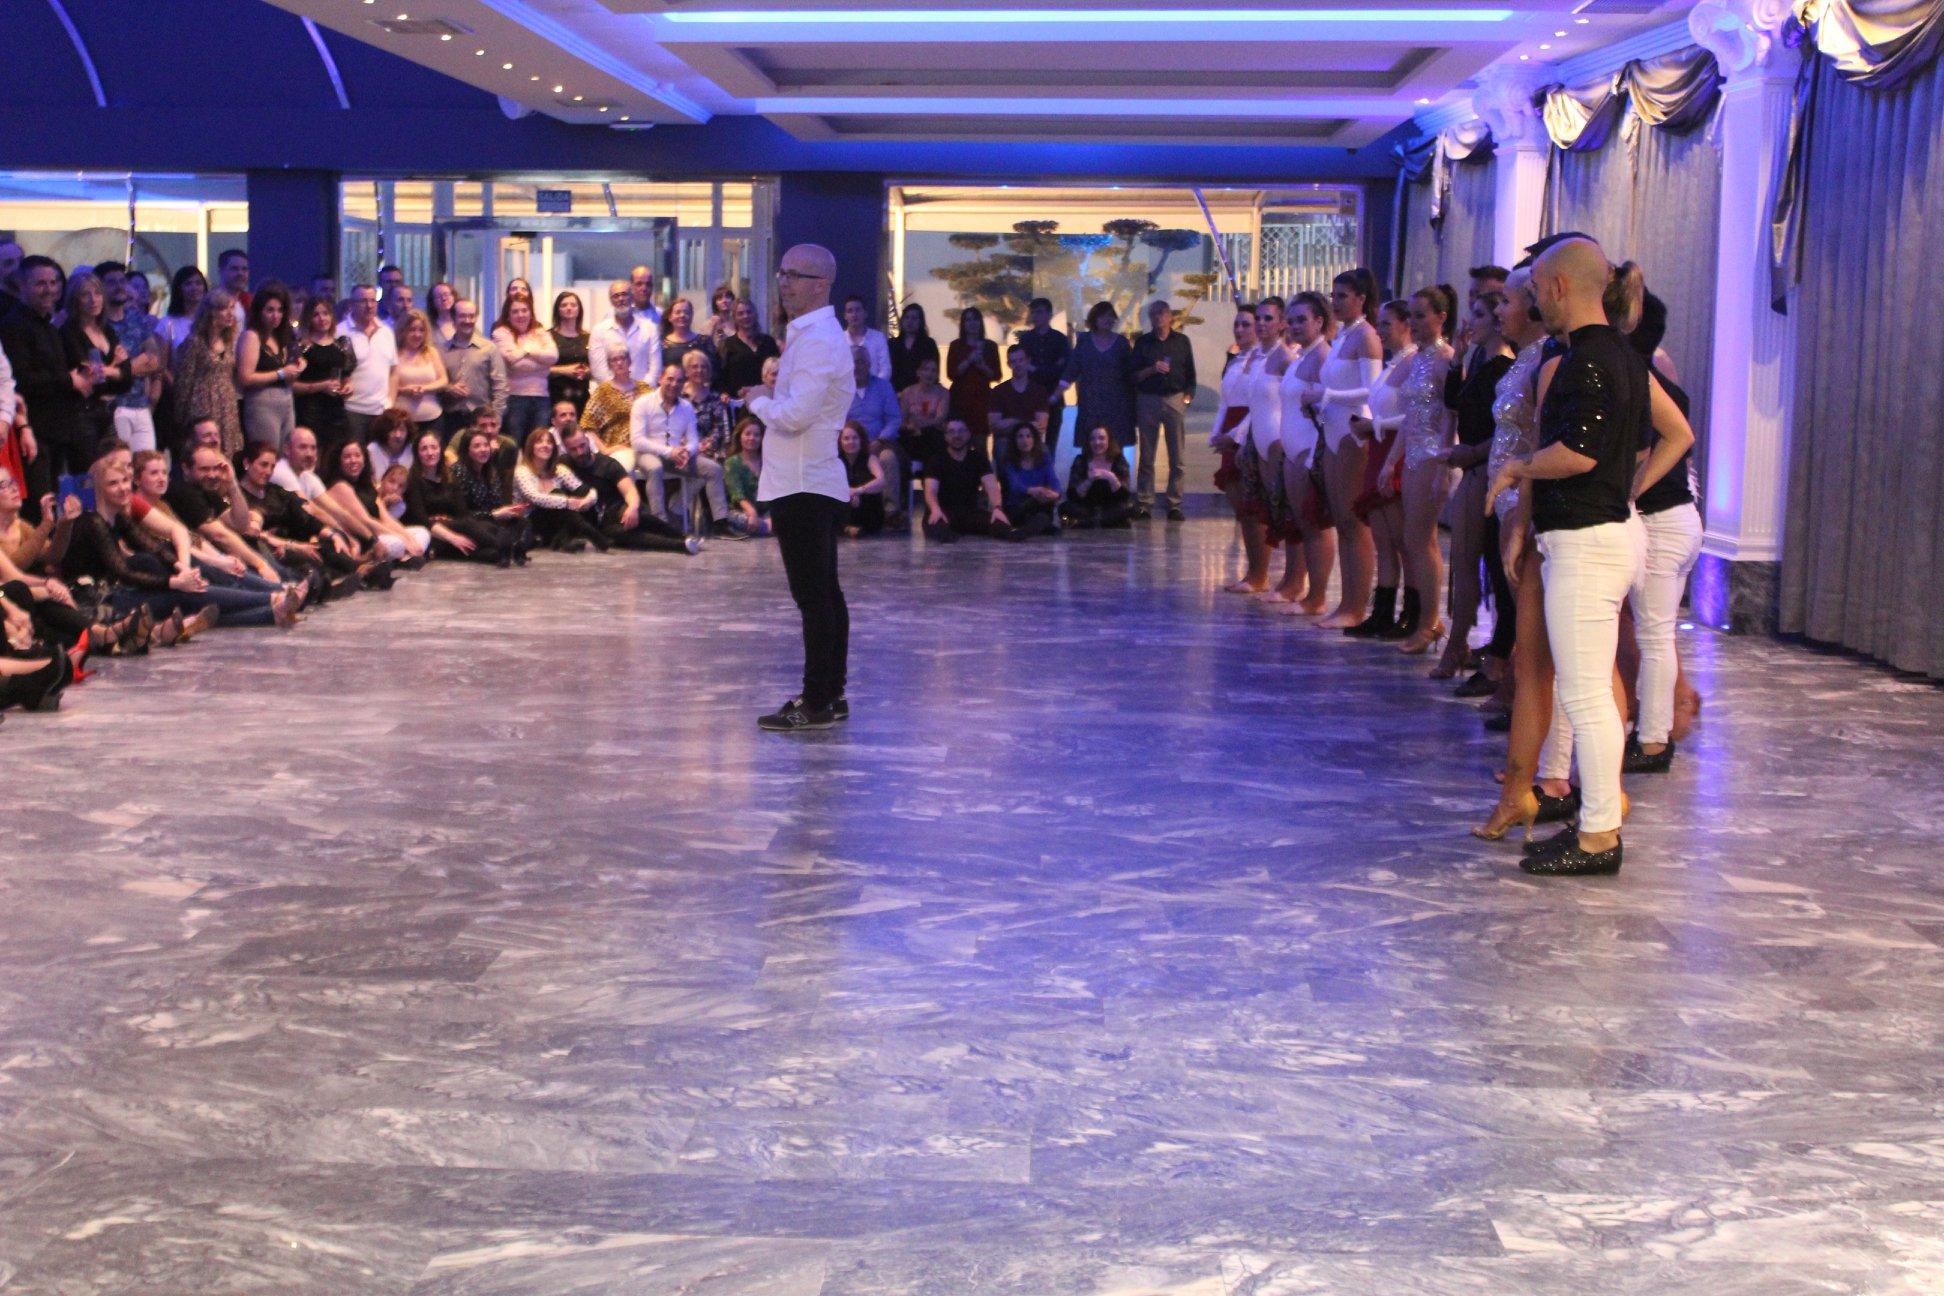 Spirito Dance Studio